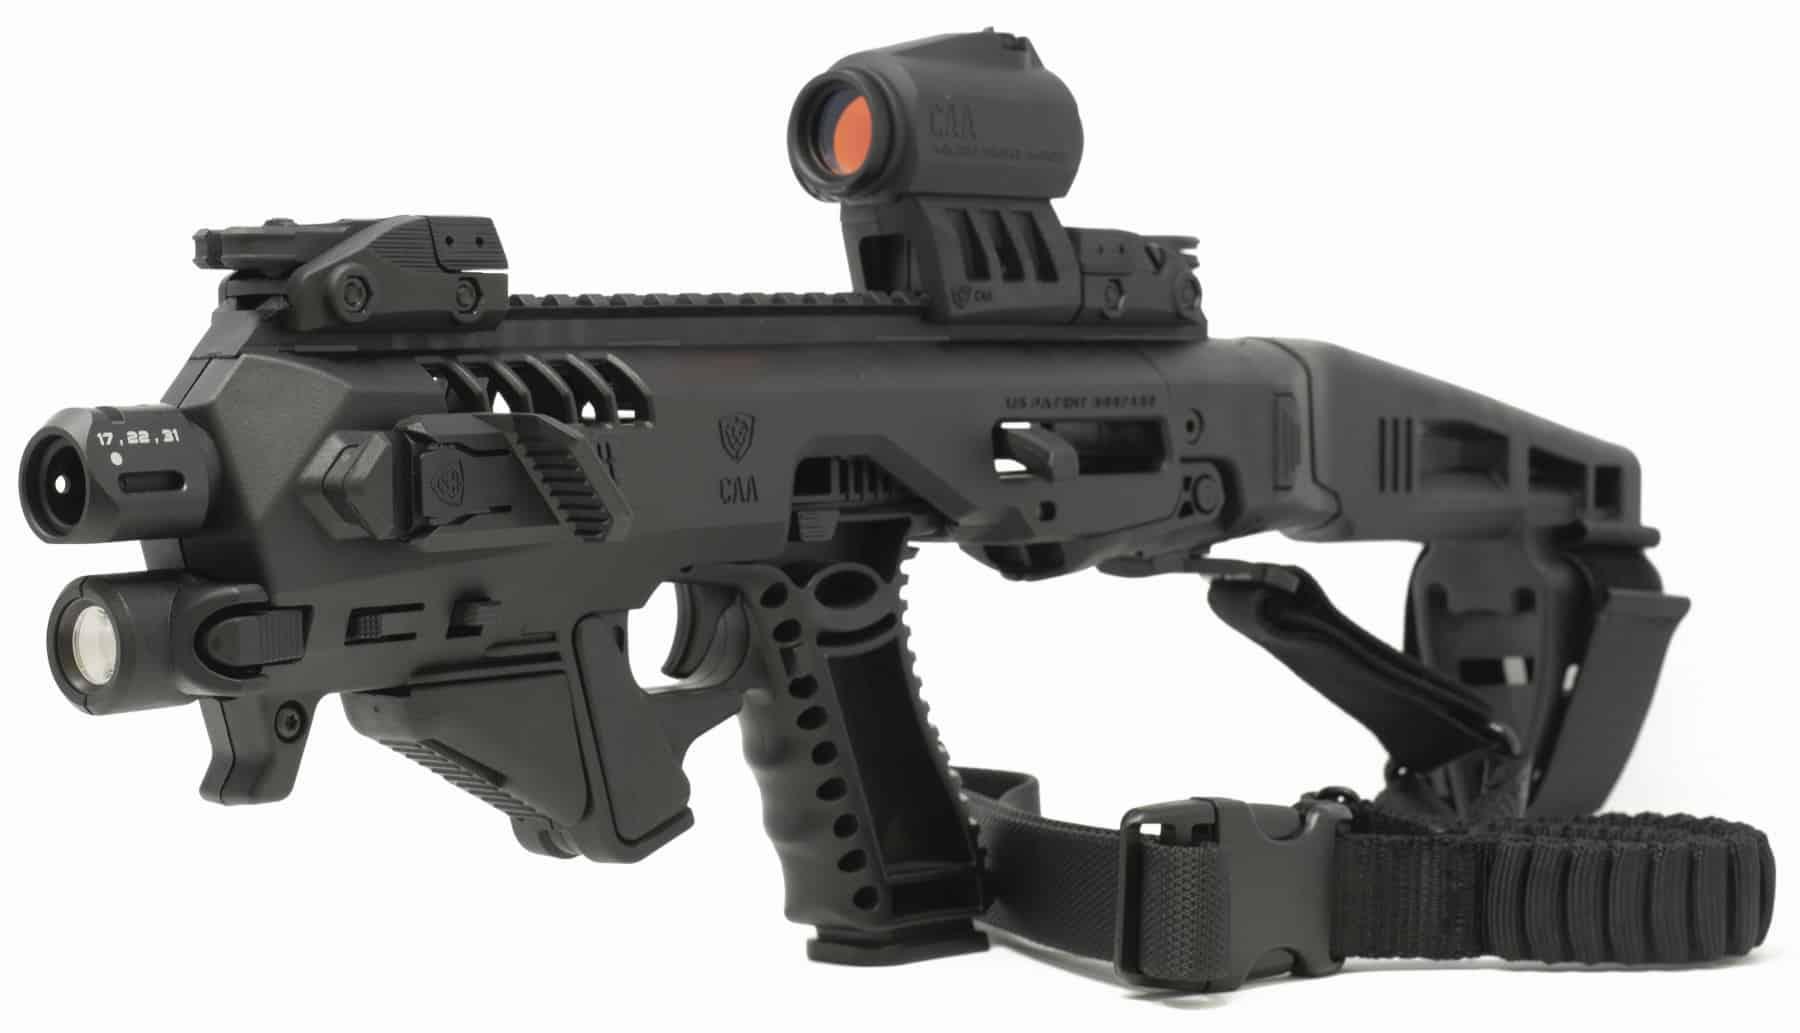 Micro Roni Glock 26 & 27 Stabilizer Gen 4 X CAA Industries NEWEST PDW Conversion Kit 2